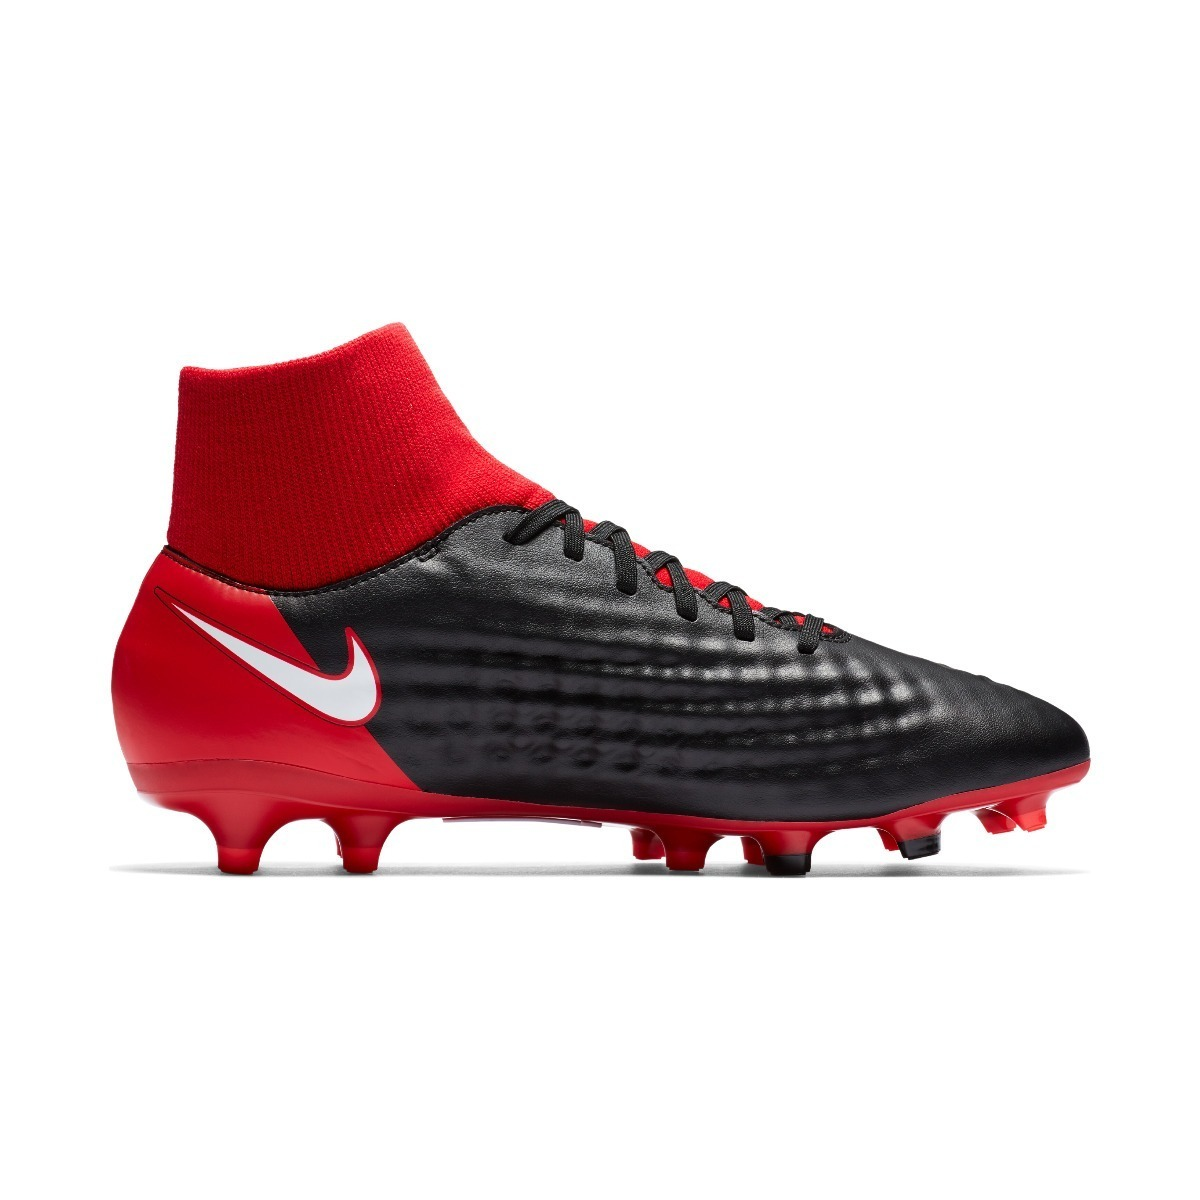 a826599e5de zapato futbol bota nike magista onda ii dyamic fit fg. Cargando zoom.